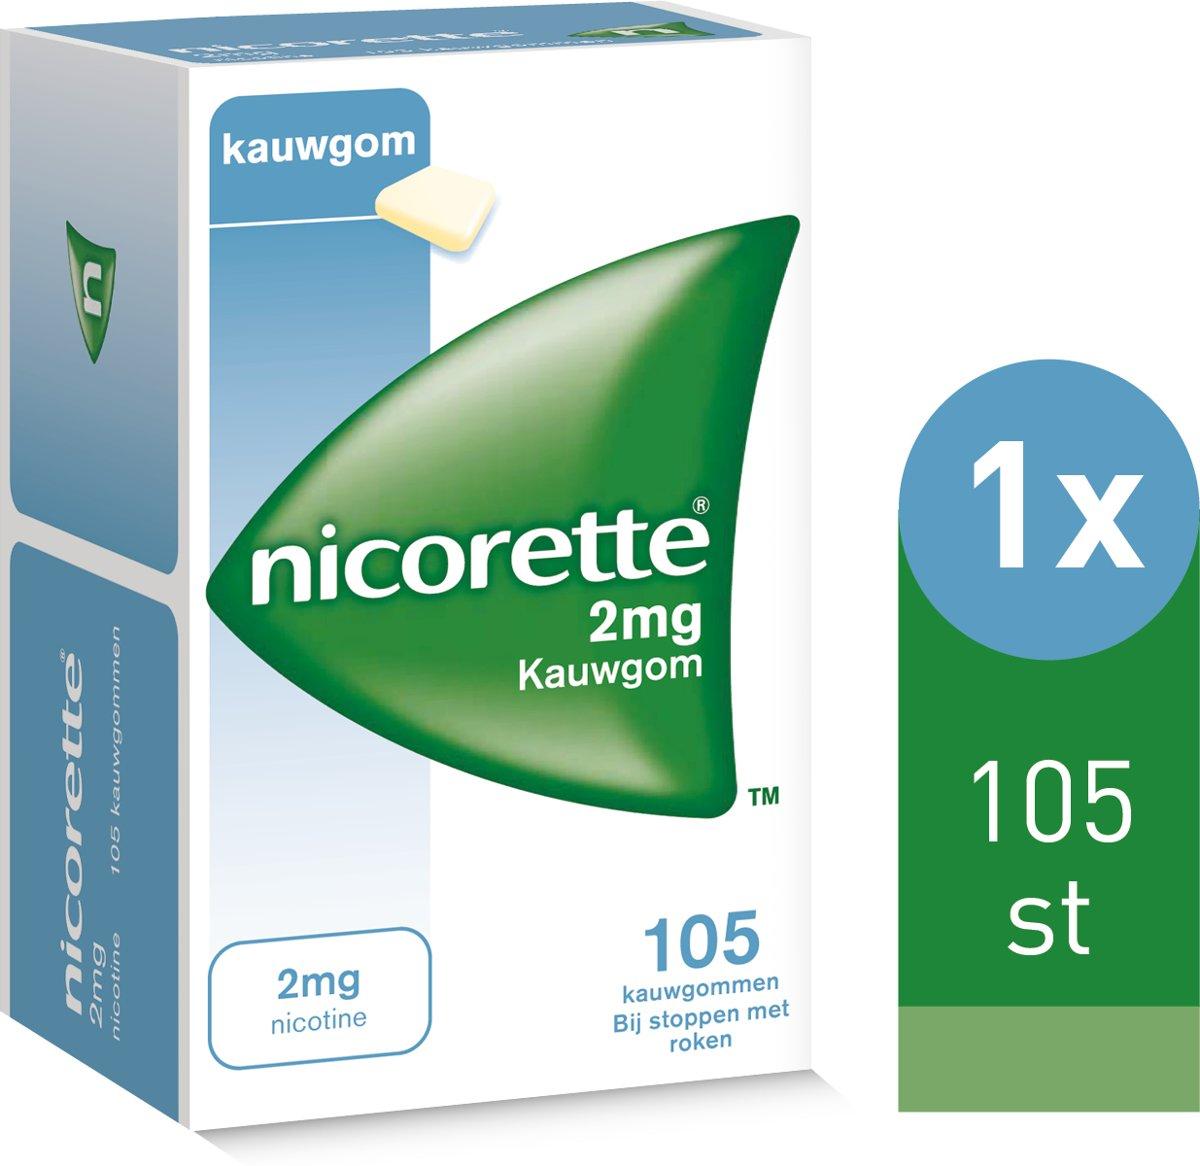 Nicorette kauwgom